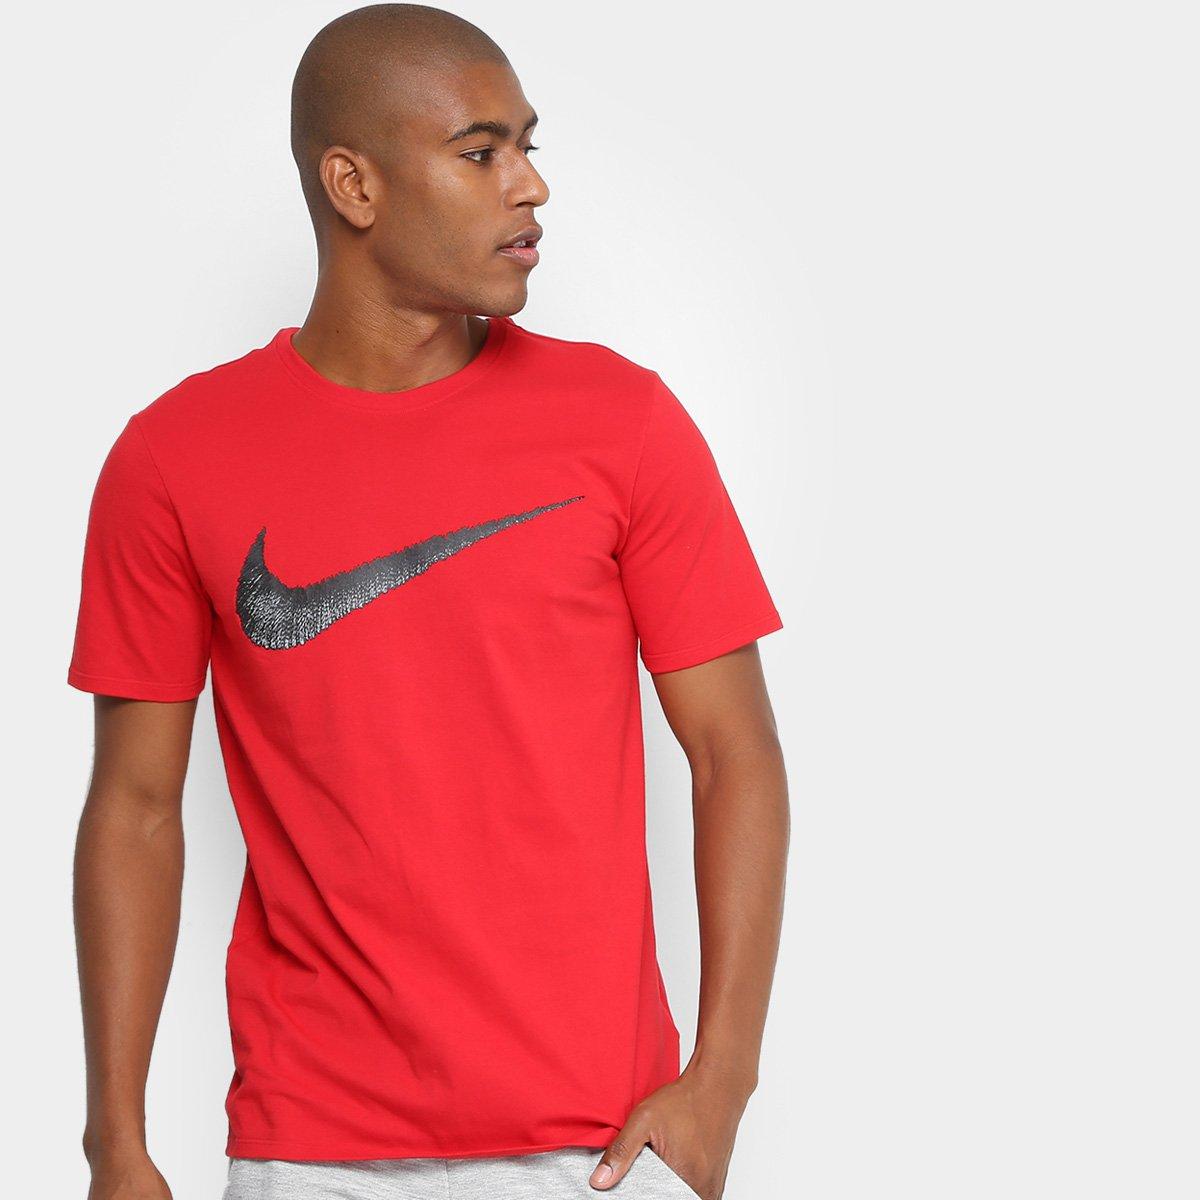 Camiseta Nike Nsw Tee Hangtag Swoosh Masculina - Compre Agora  cdb1ca63a83ce